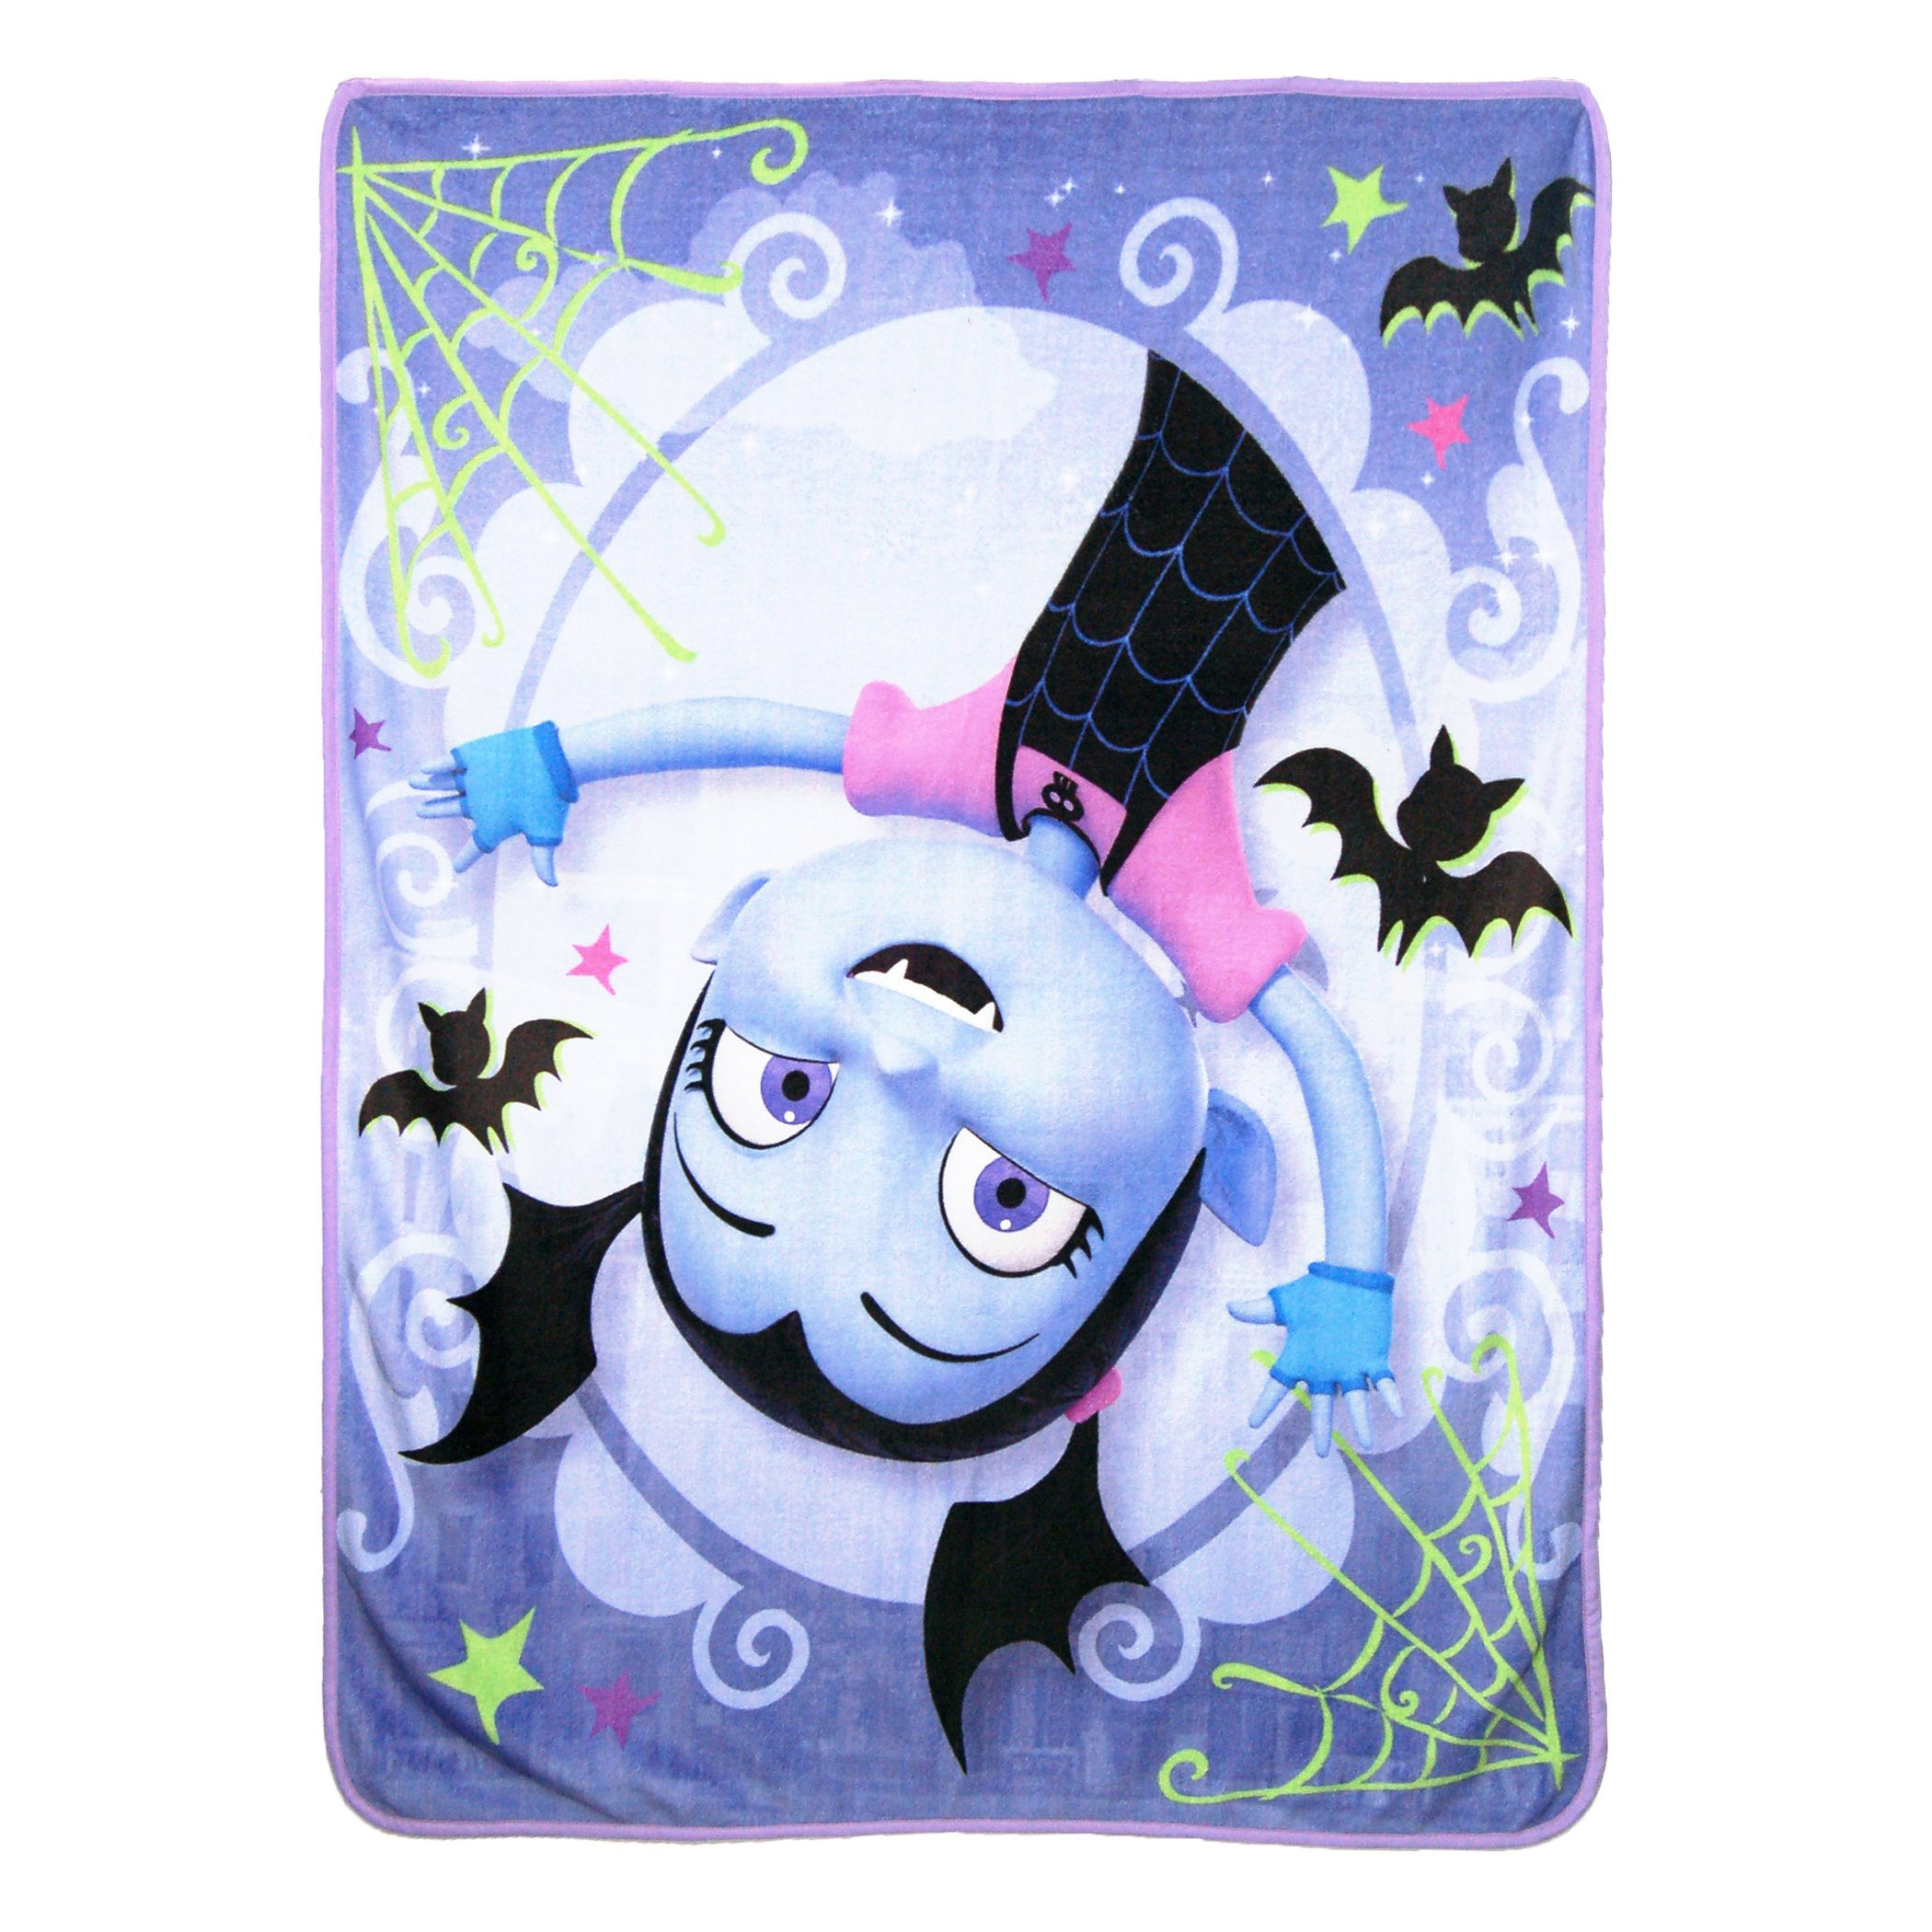 Disney's Vampirina, ''Batty Vee'' Micro Raschel Throw Blanket, 46'' x 60'', Multi Color